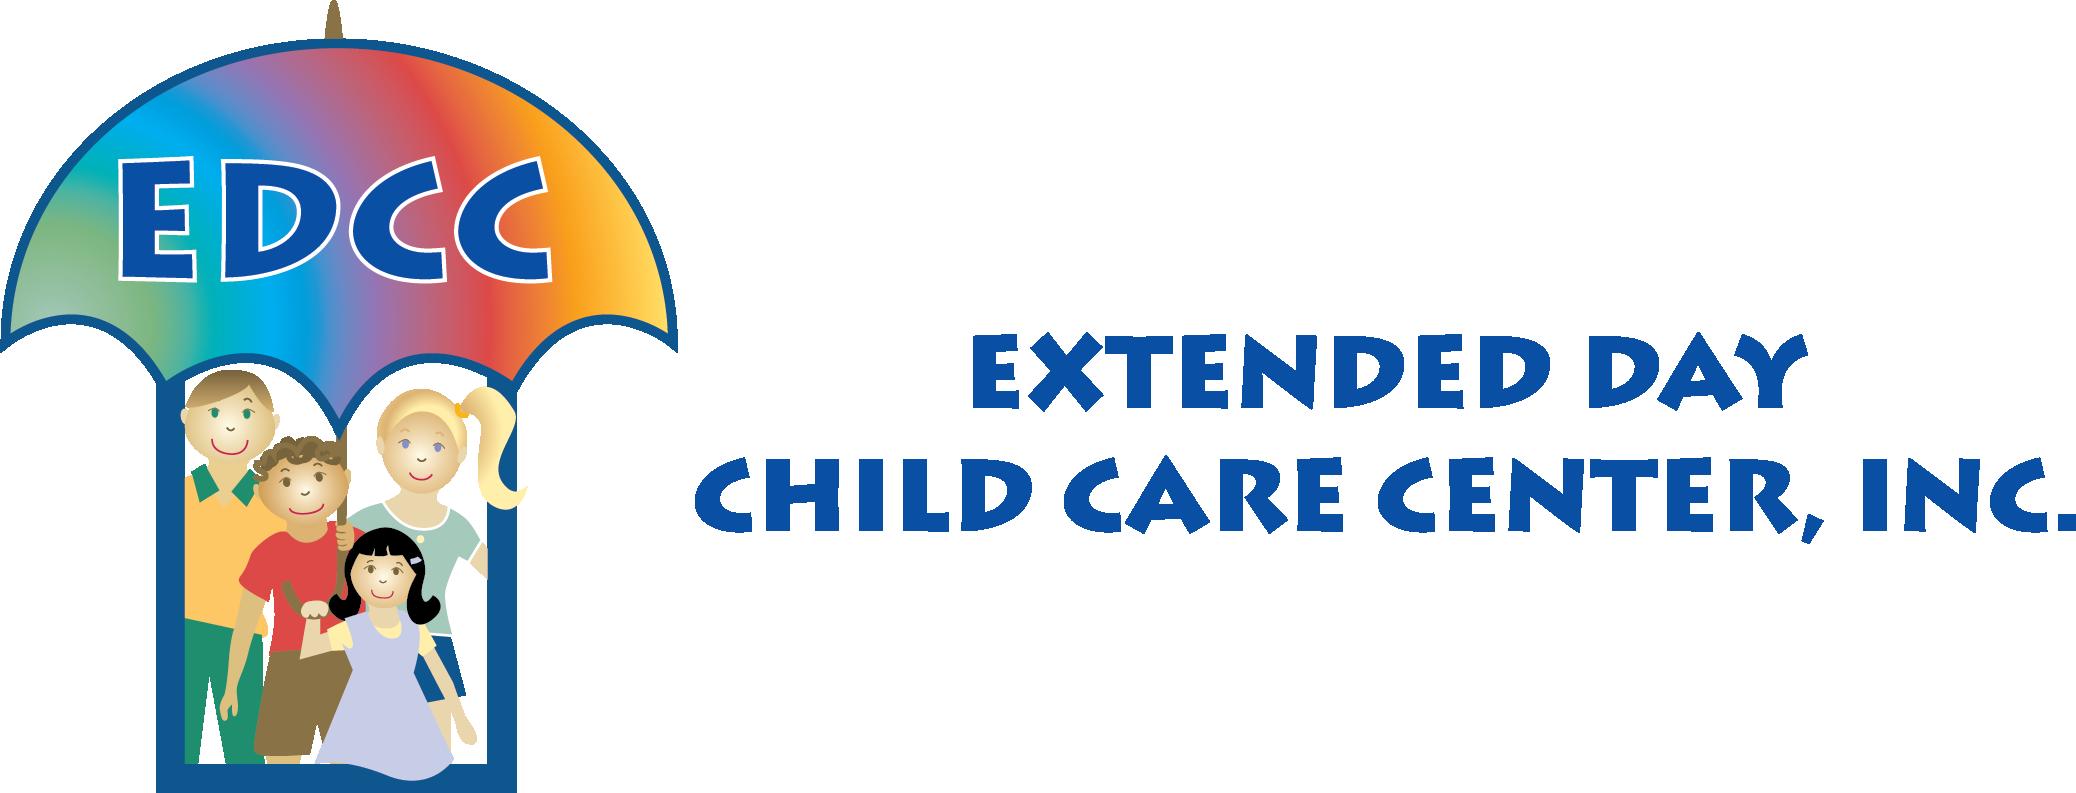 EDCC Logo